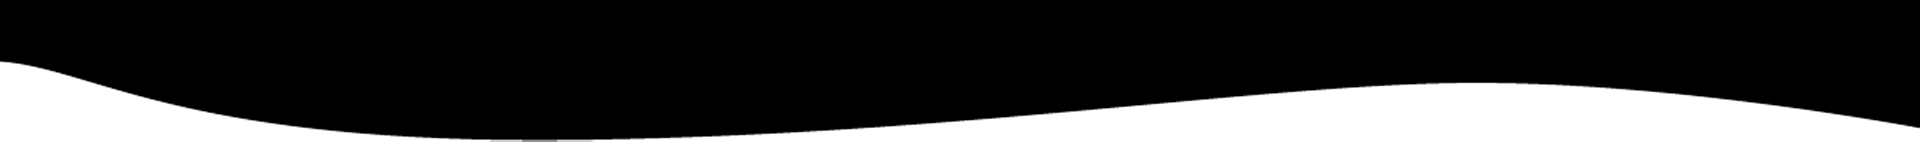 Titlebar-shape-dual